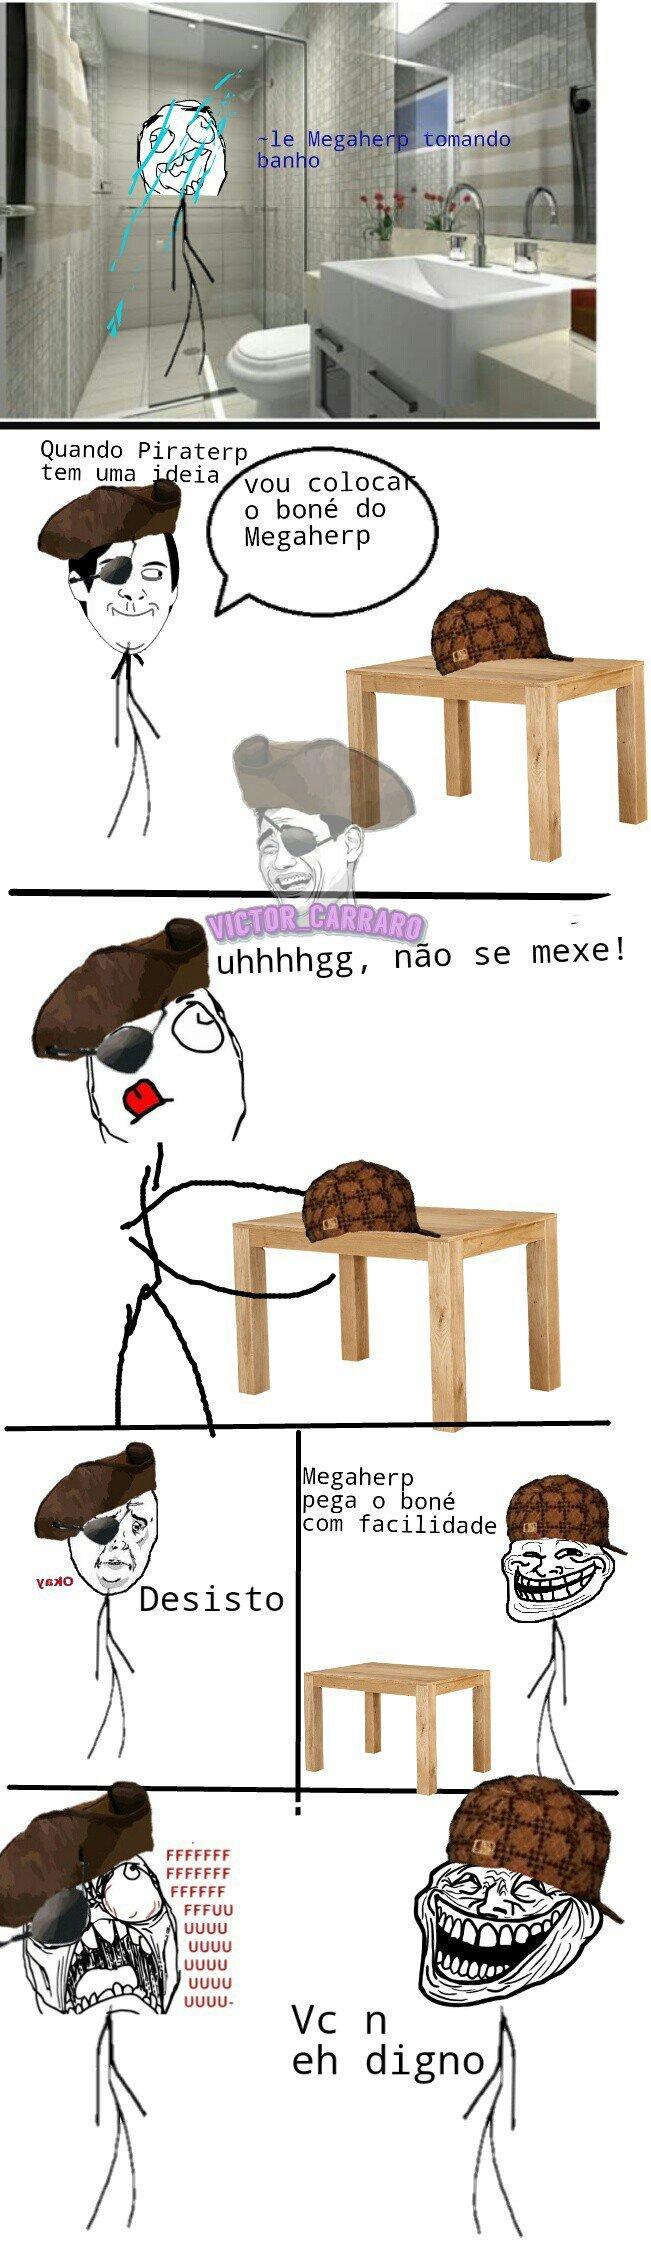 Megaherp - meme